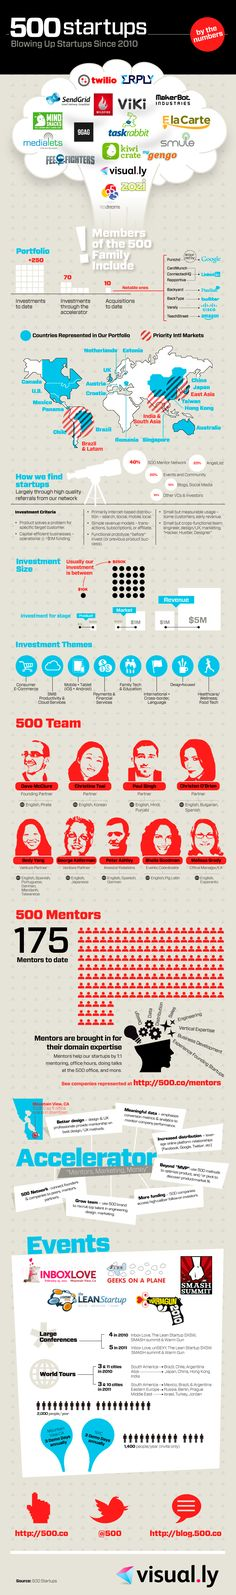 La aceleradora 500 Startup busca Emprendedores en Latinoamérica